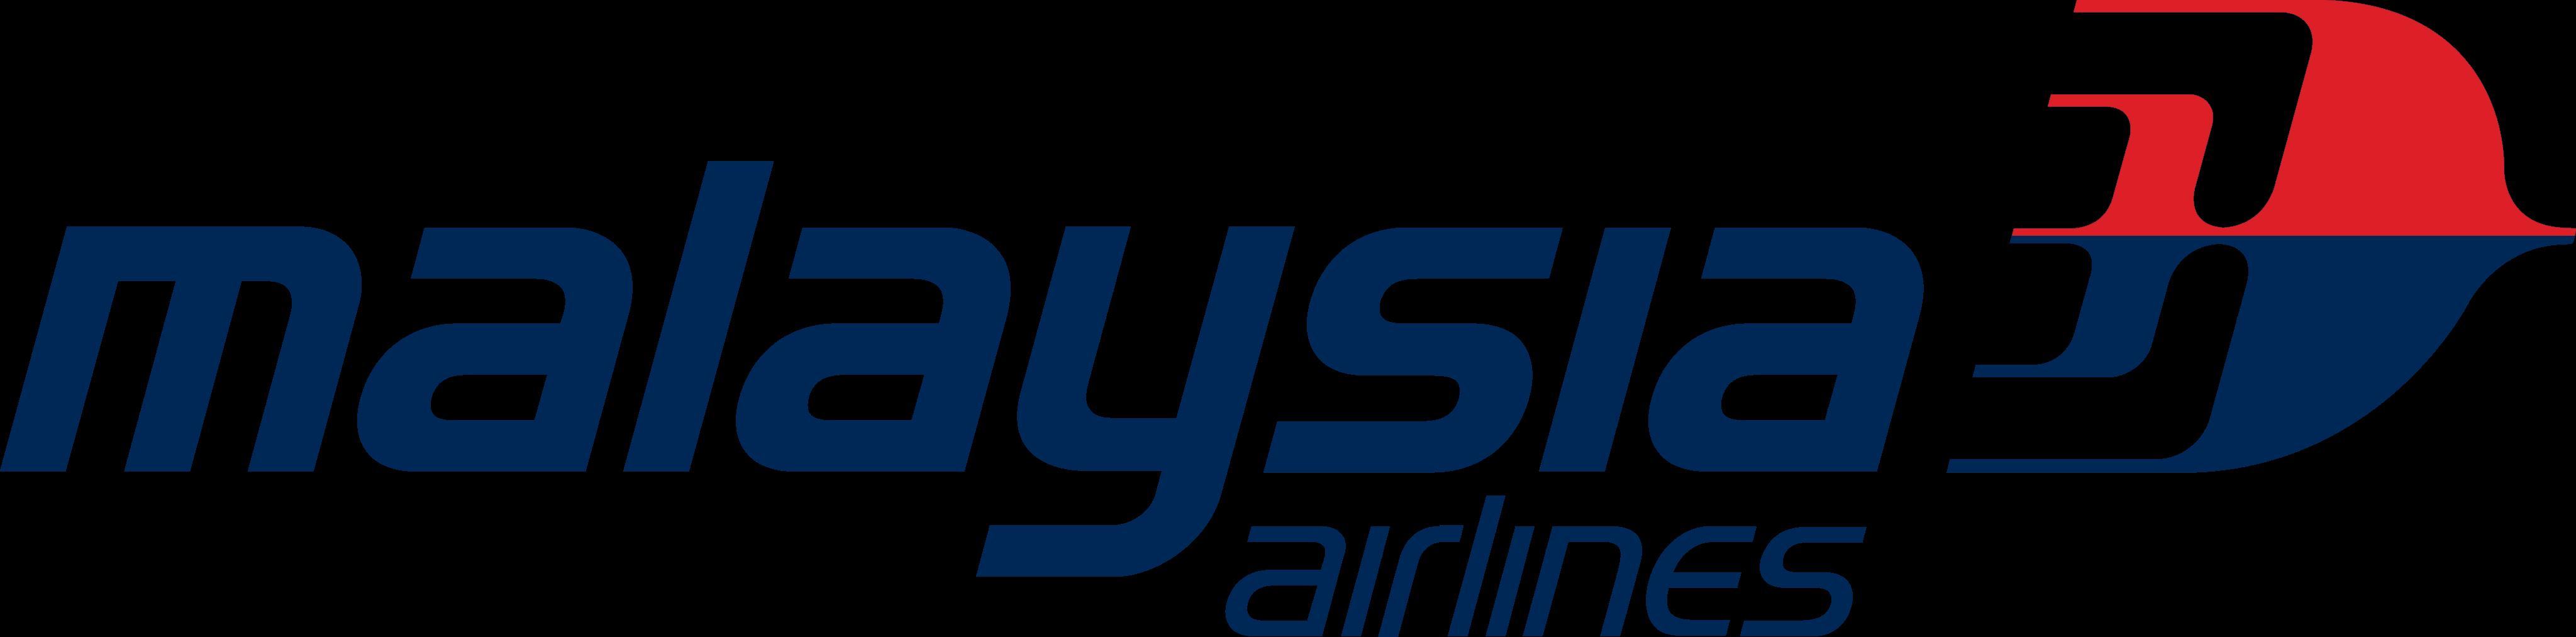 malaysia airlines logo 1 - Malaysia Airlines Logo